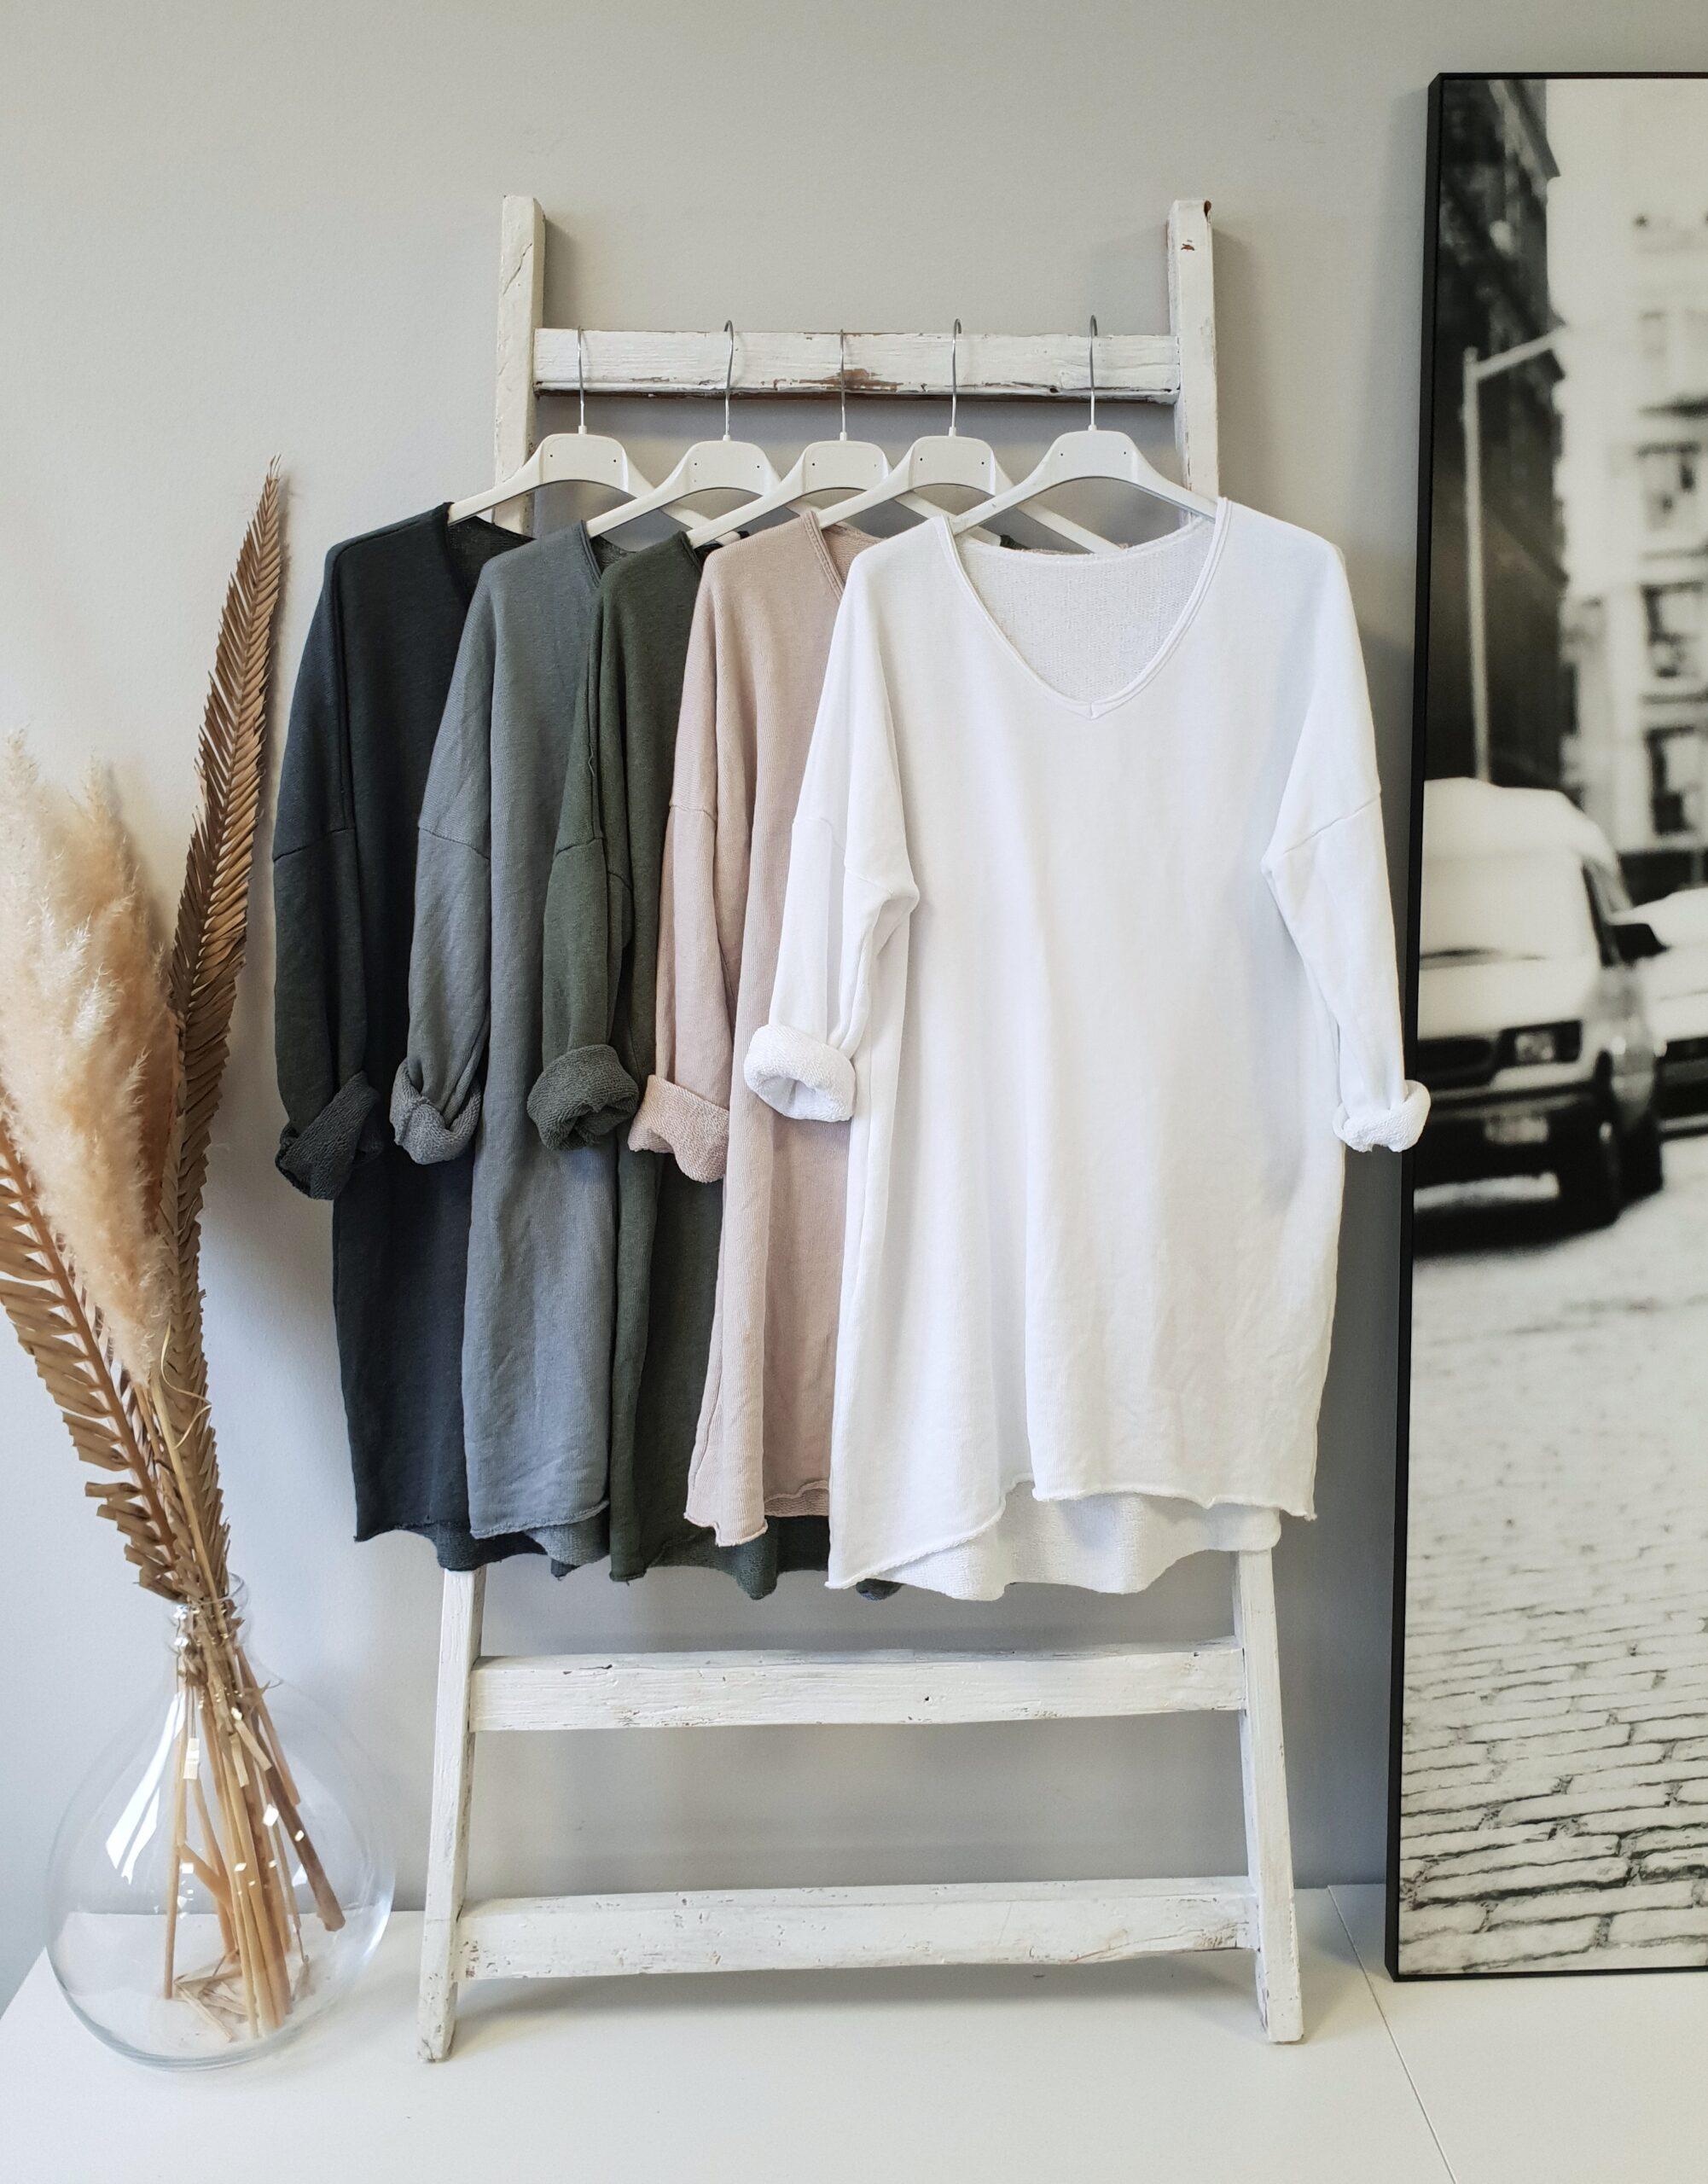 Longsweater V-Neck BASIC BUT BEAUTIFUL – AUTUMN COLOURS